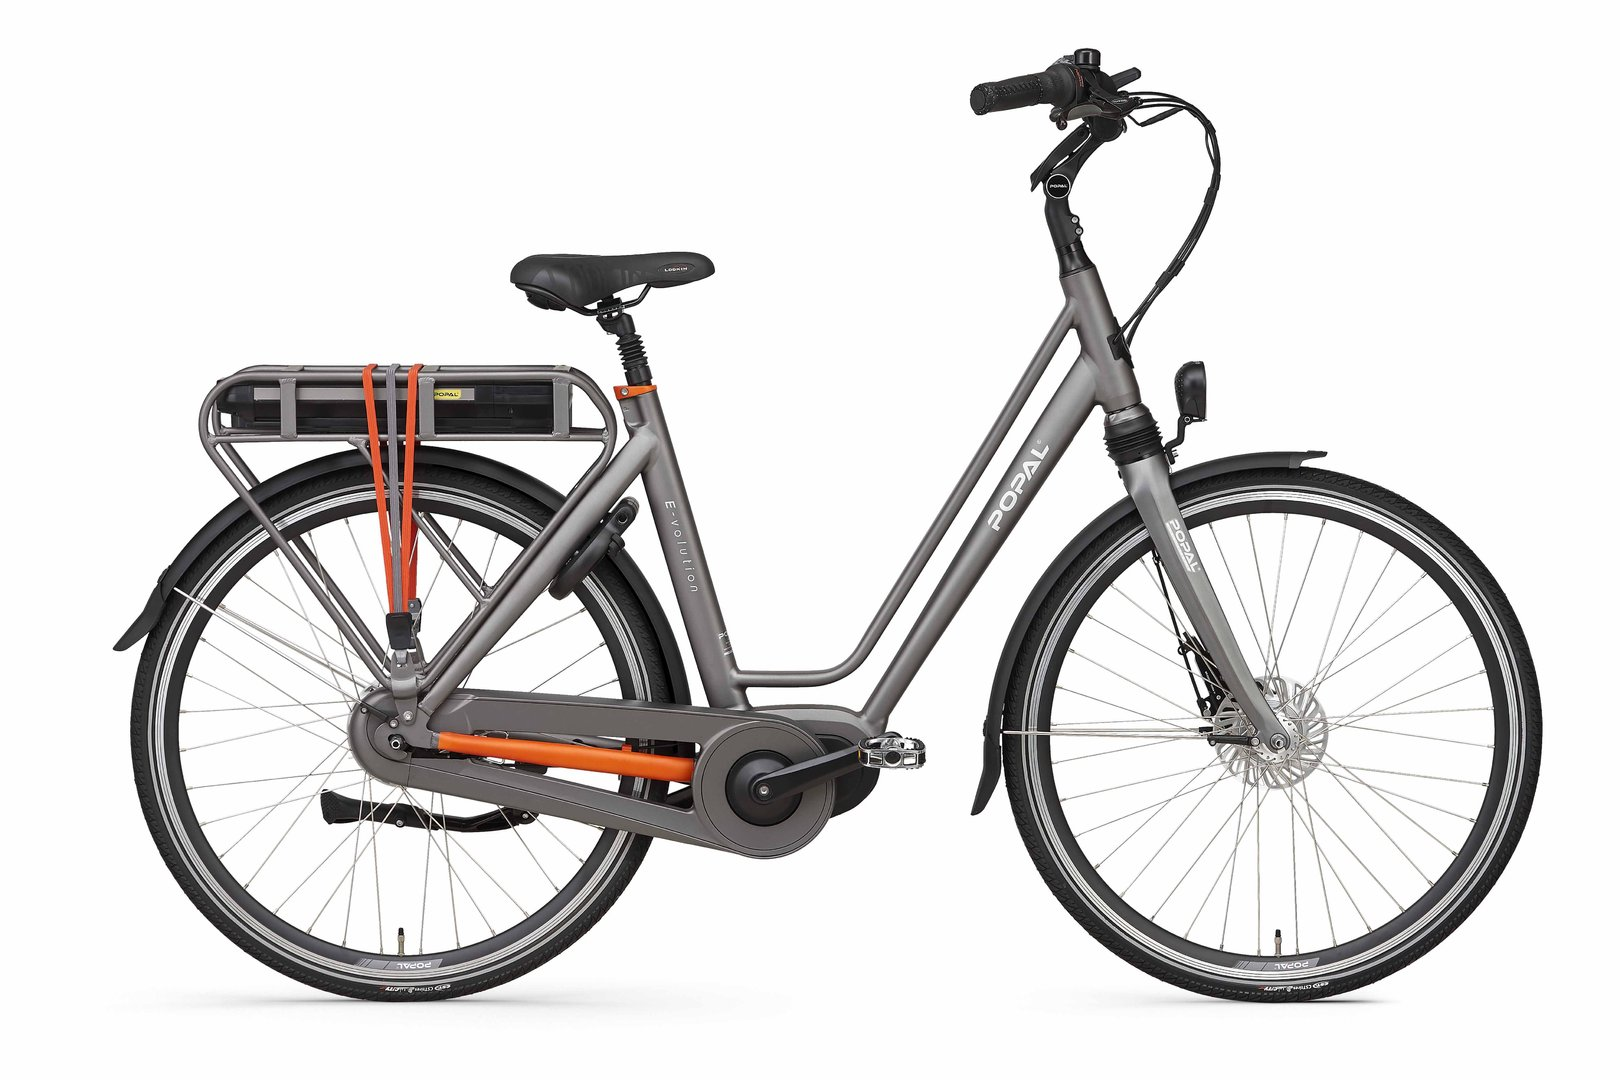 e volution 10 0 8 gang shimano nexus pedelec e bike. Black Bedroom Furniture Sets. Home Design Ideas